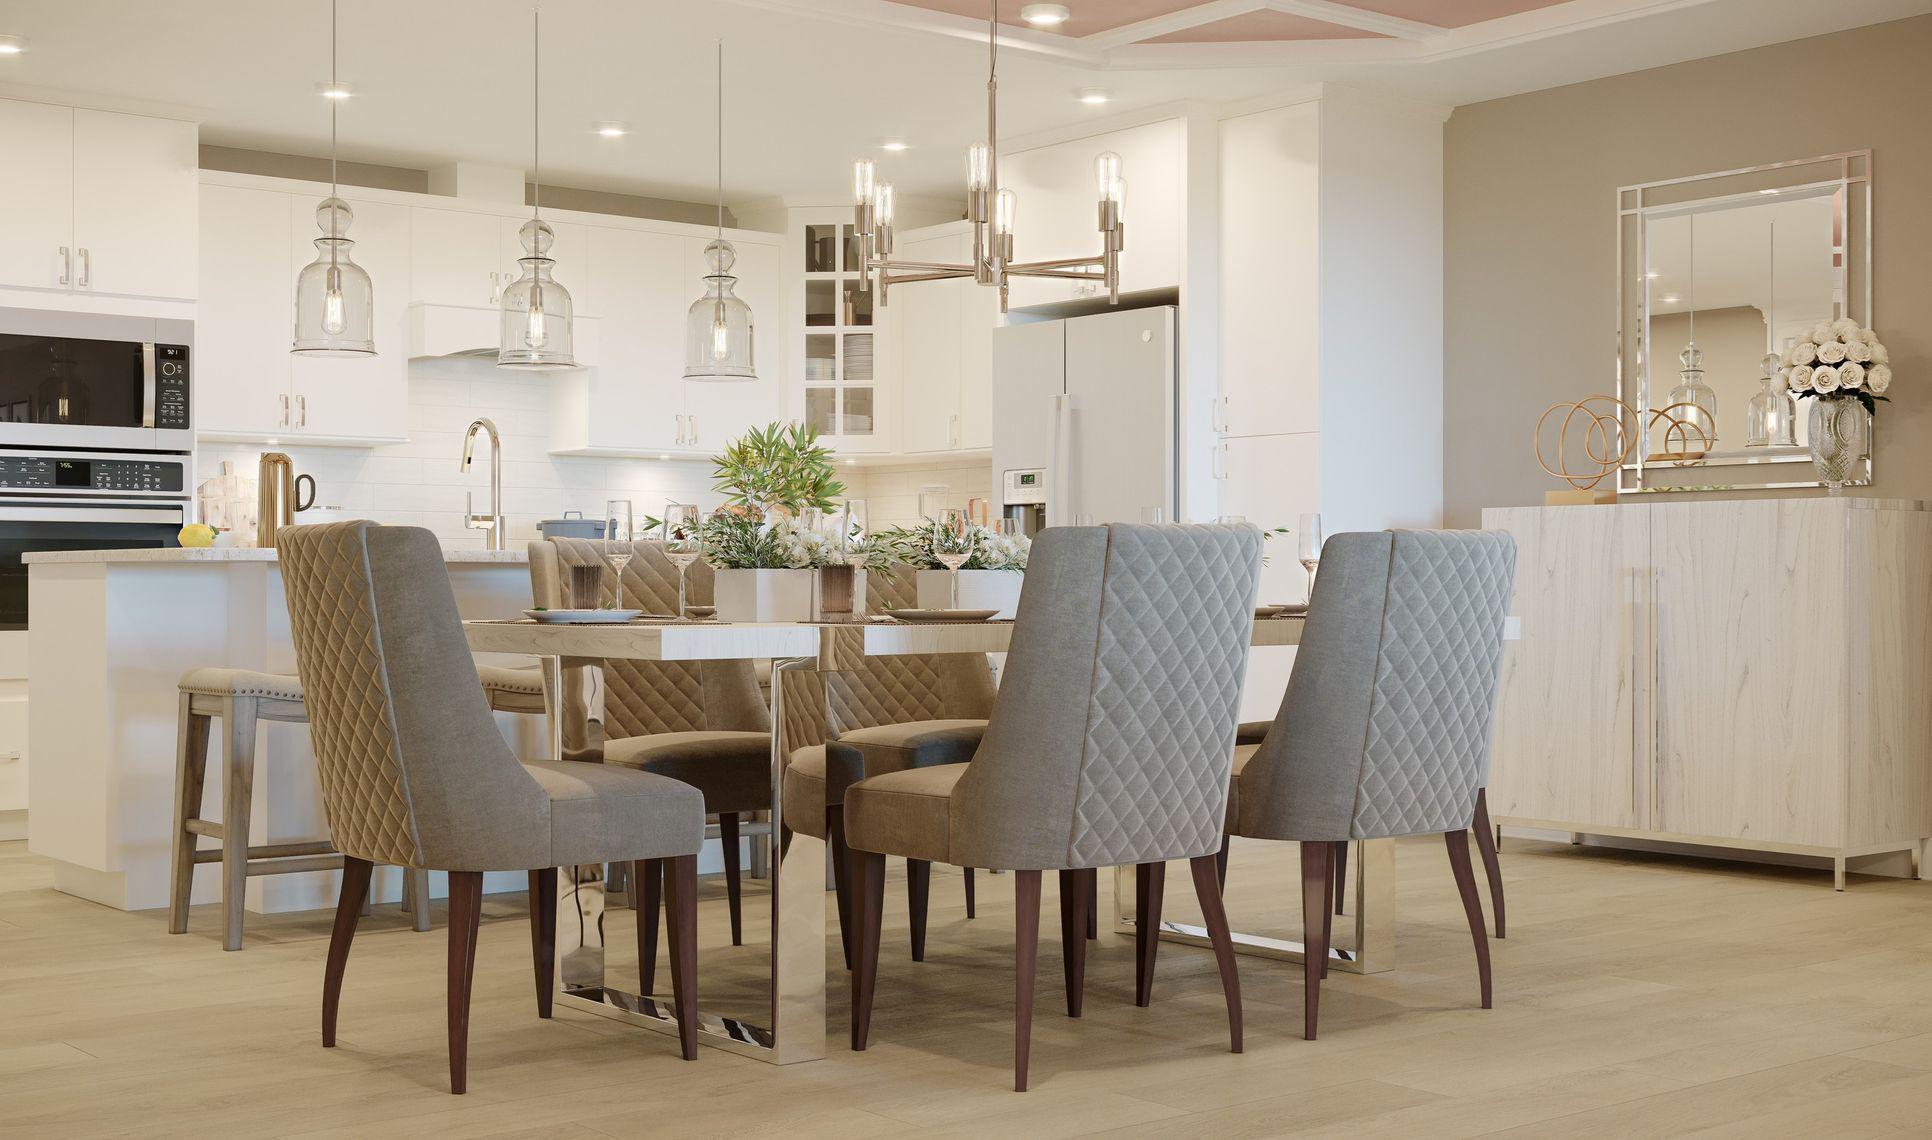 Interior:Charming dining area